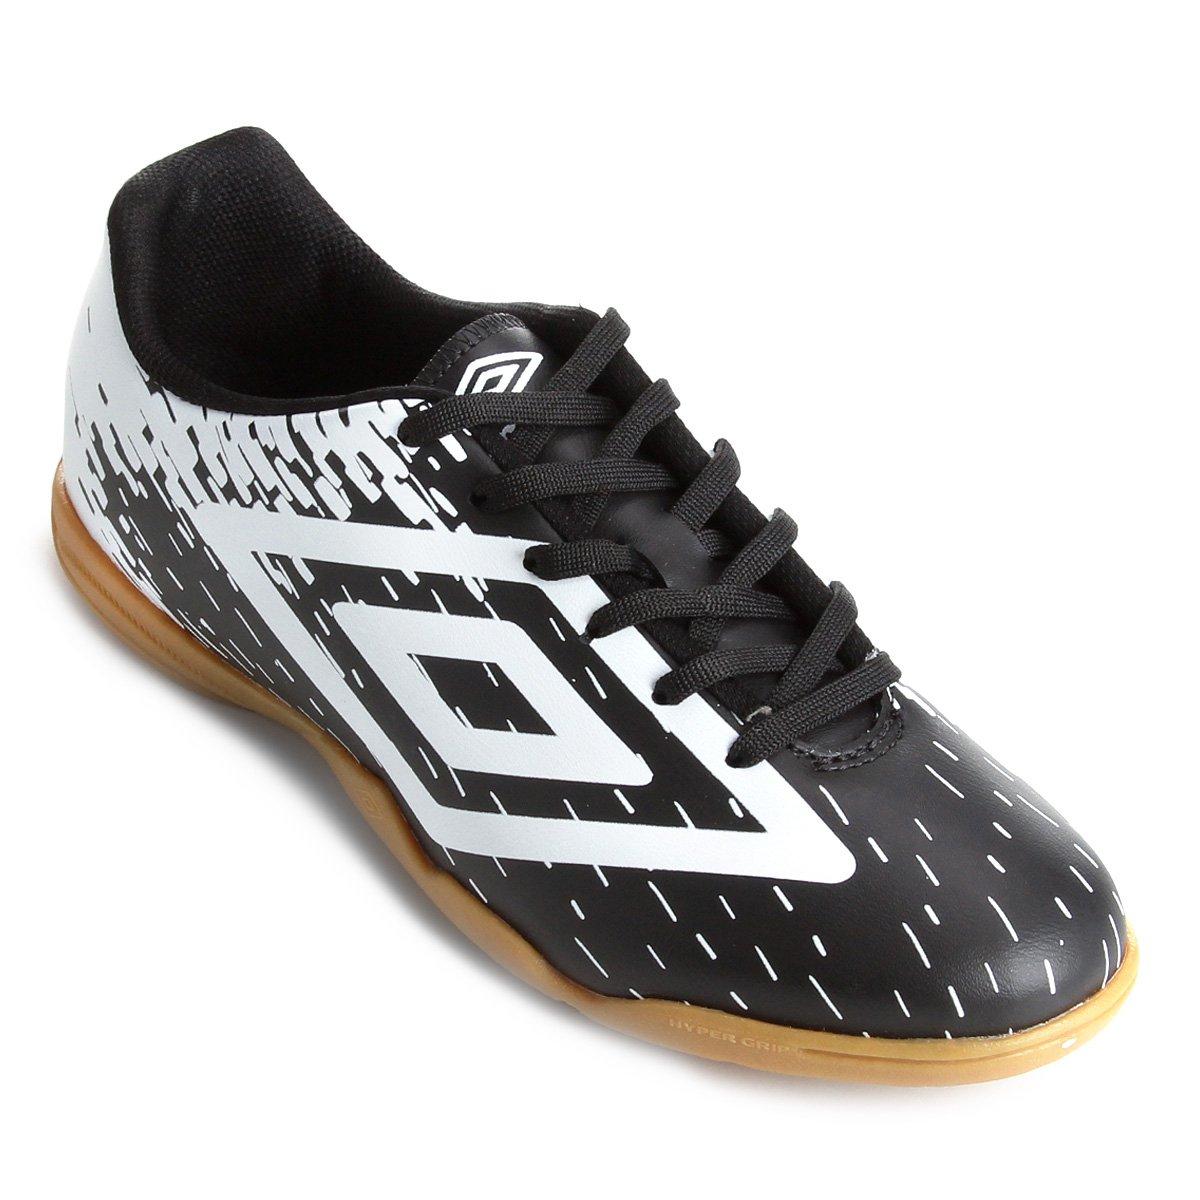 4b32d30bde Chuteira Futsal Umbro Acid Preto E Branco Compre Agora Netshoes